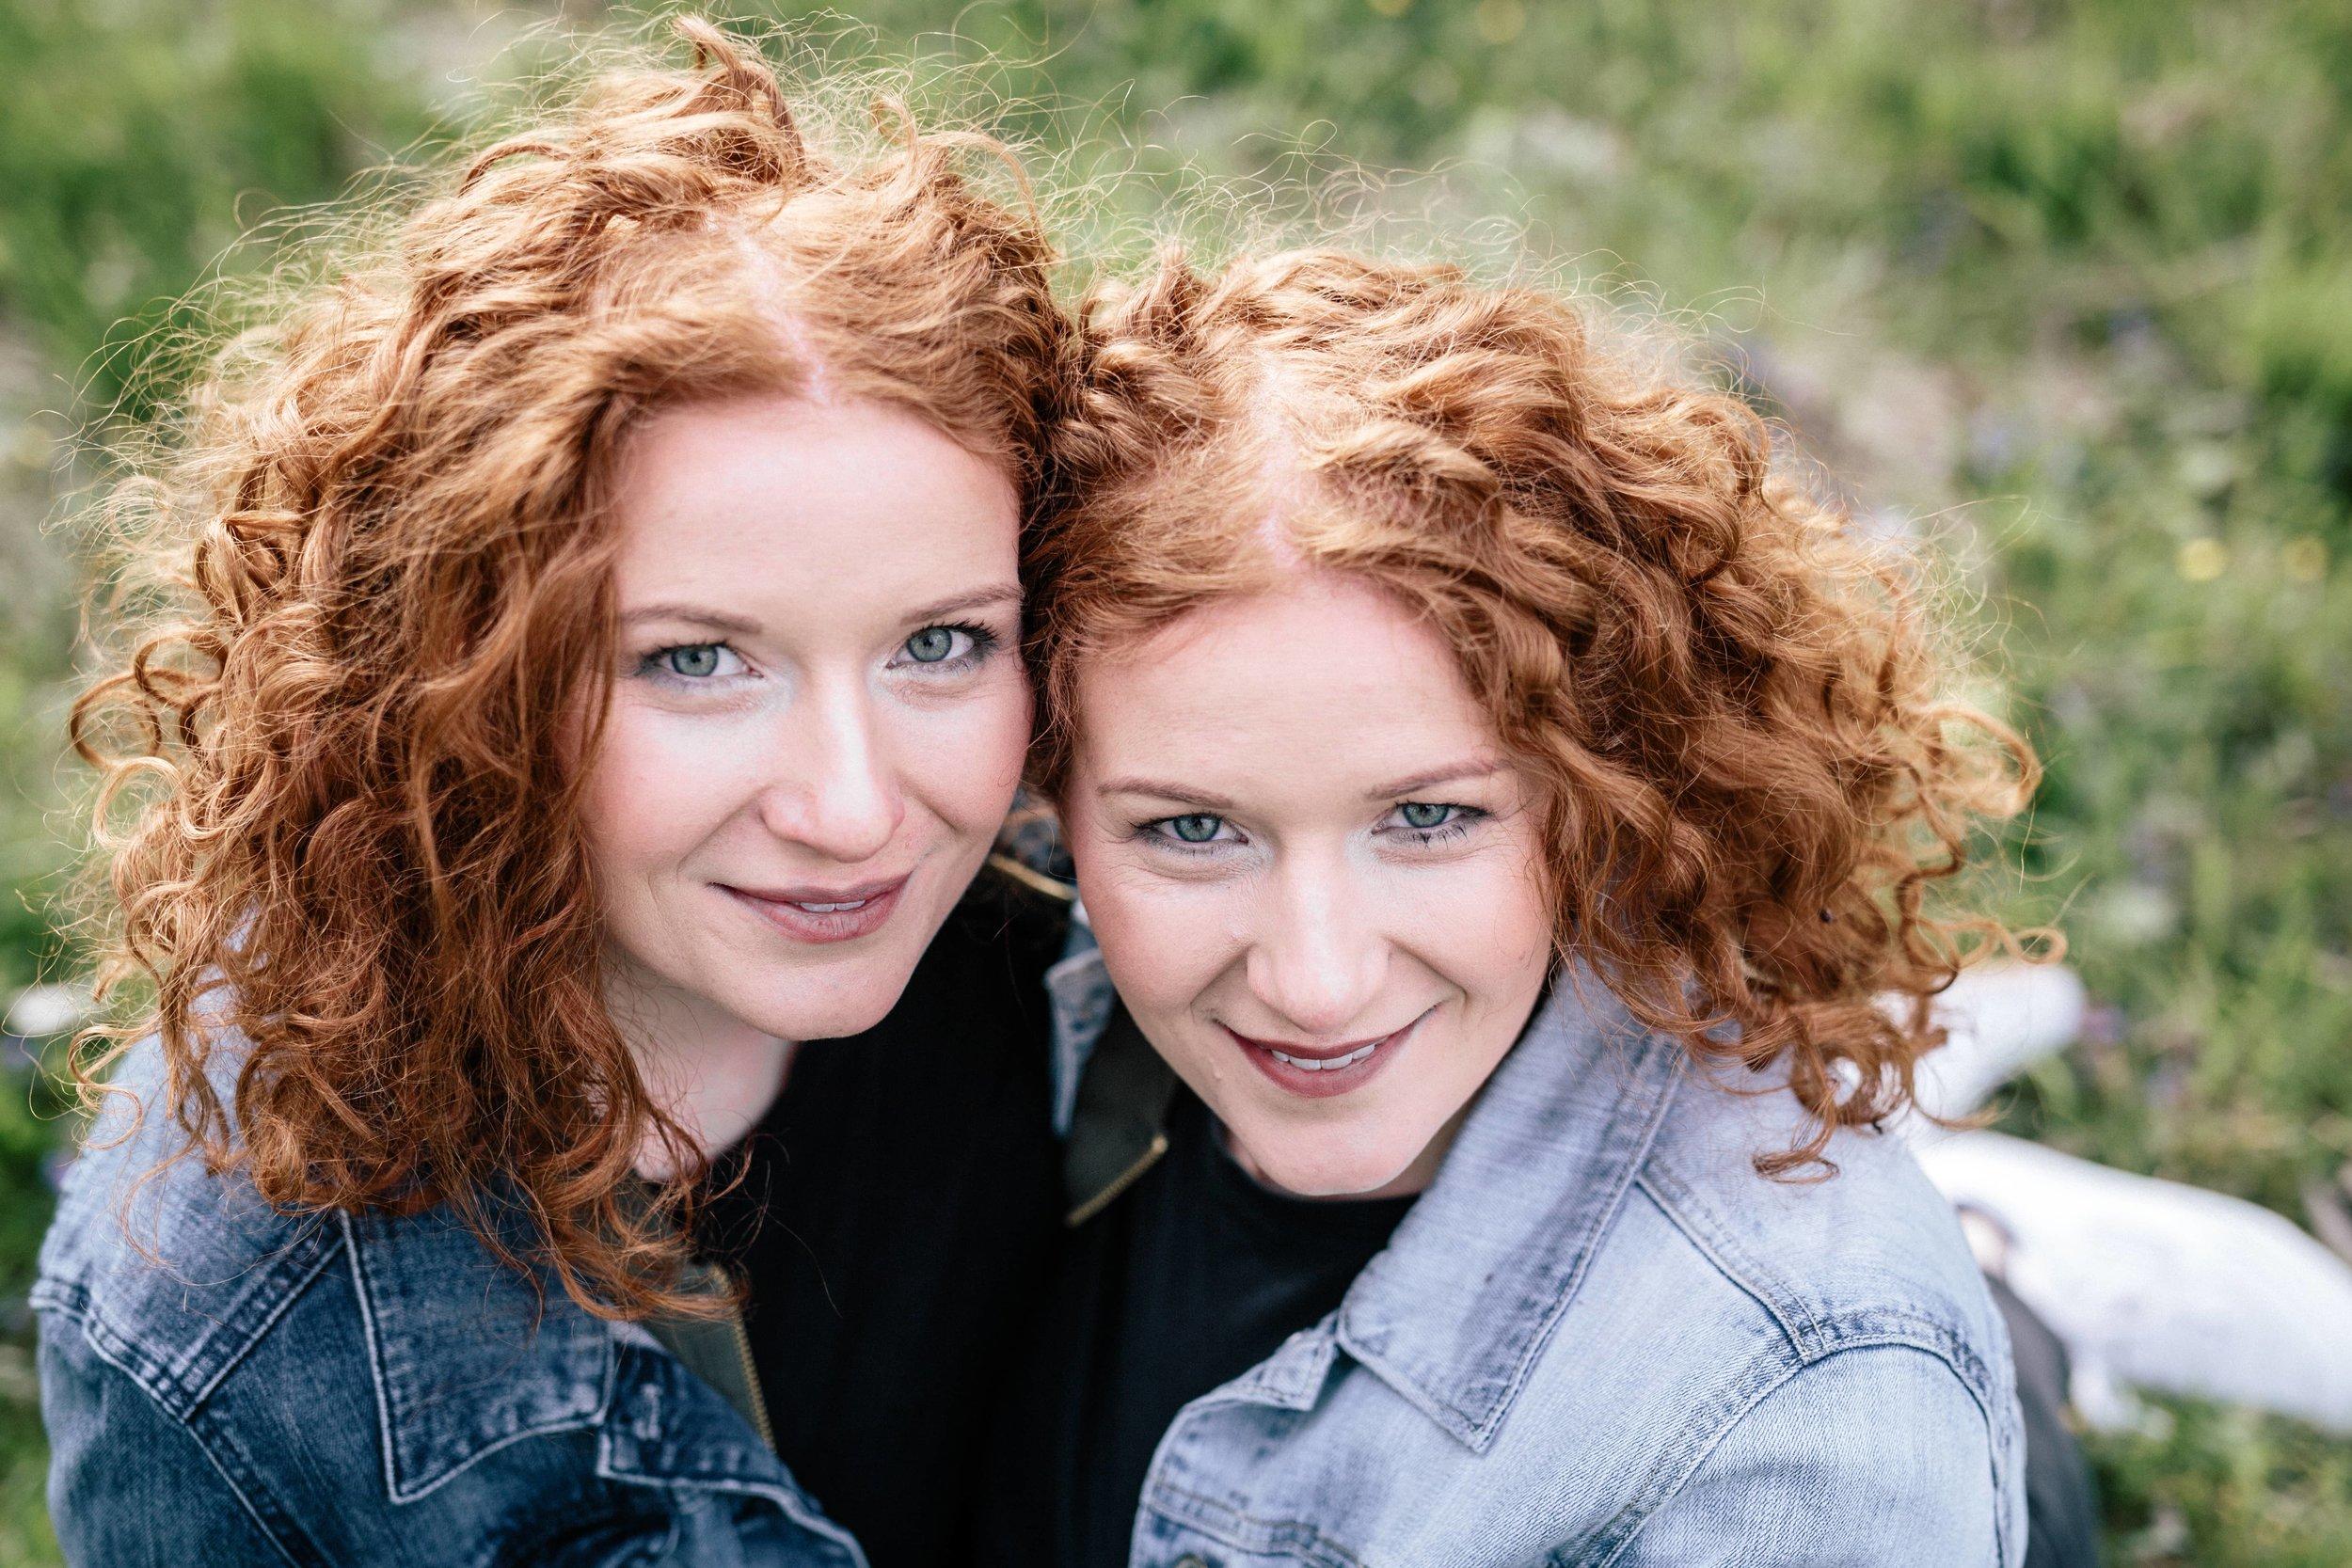 Zwillinge-138.jpg